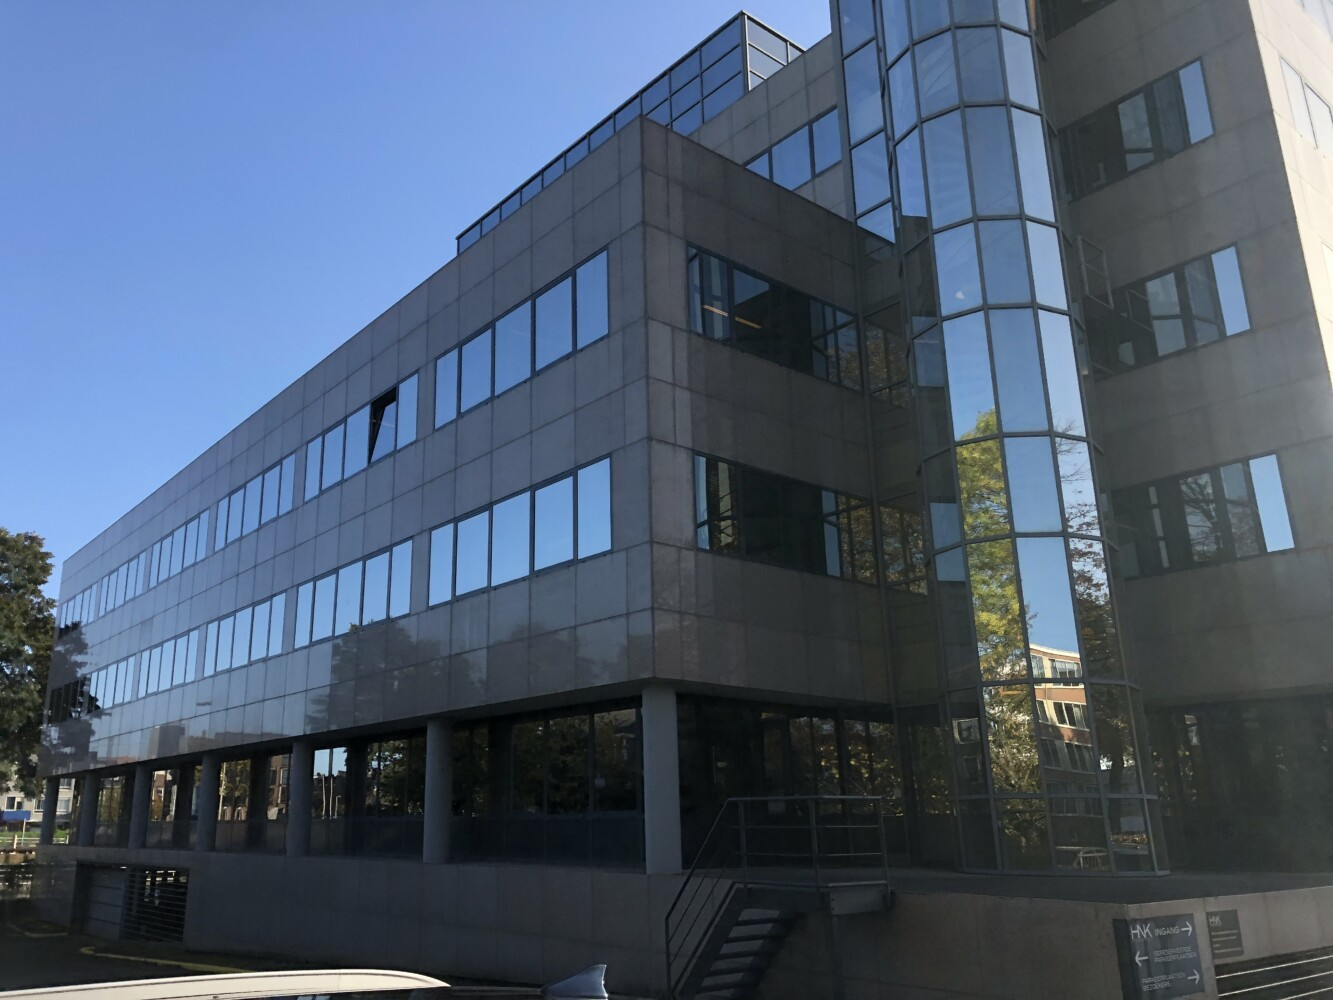 Kantoor NSI